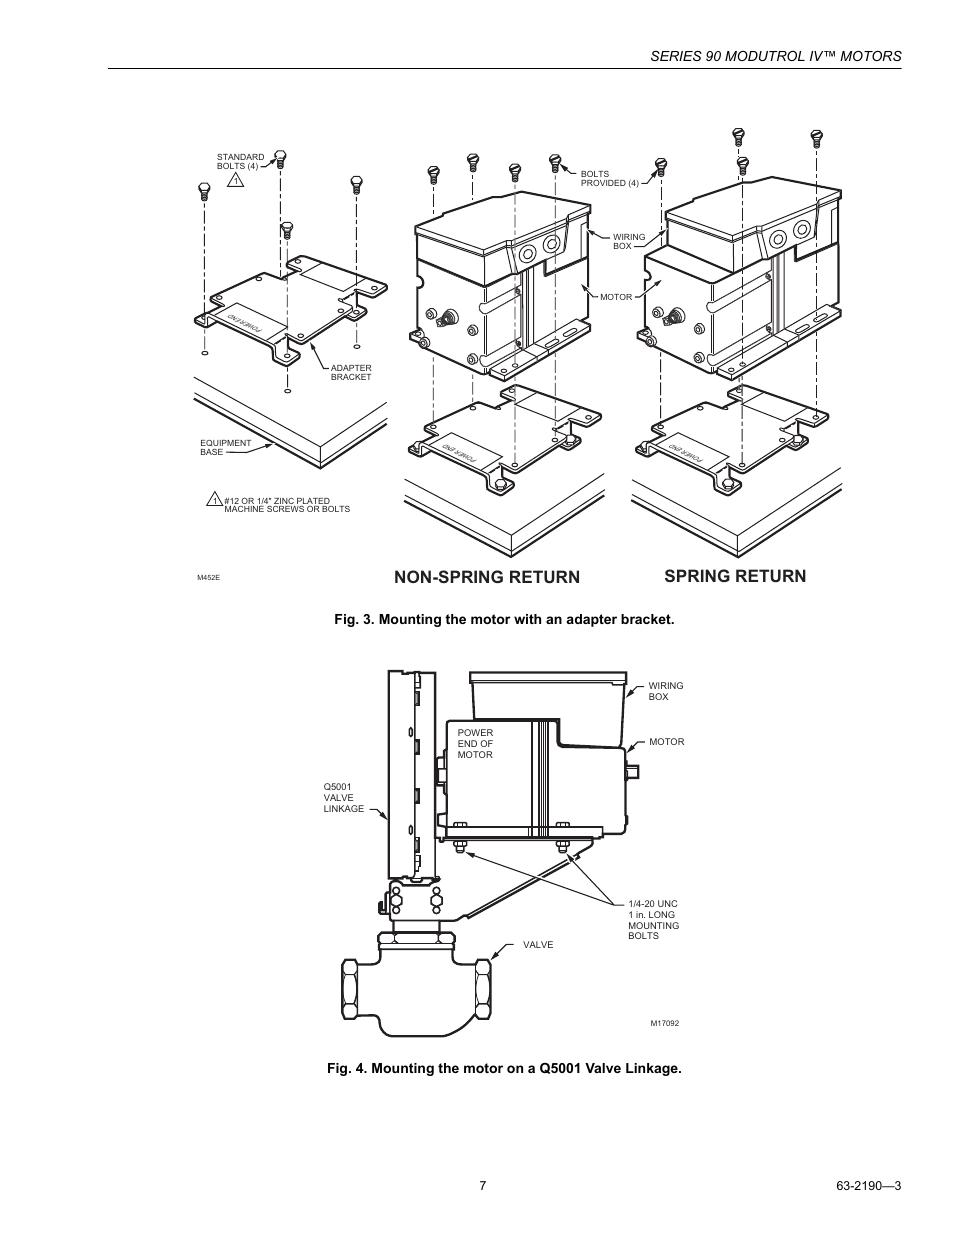 Non-spring return spring return, Series 90 modutrol iv™ motors | Honeywell  Modutrol IV Motors Series 90 User Manual | Page 7 / 12